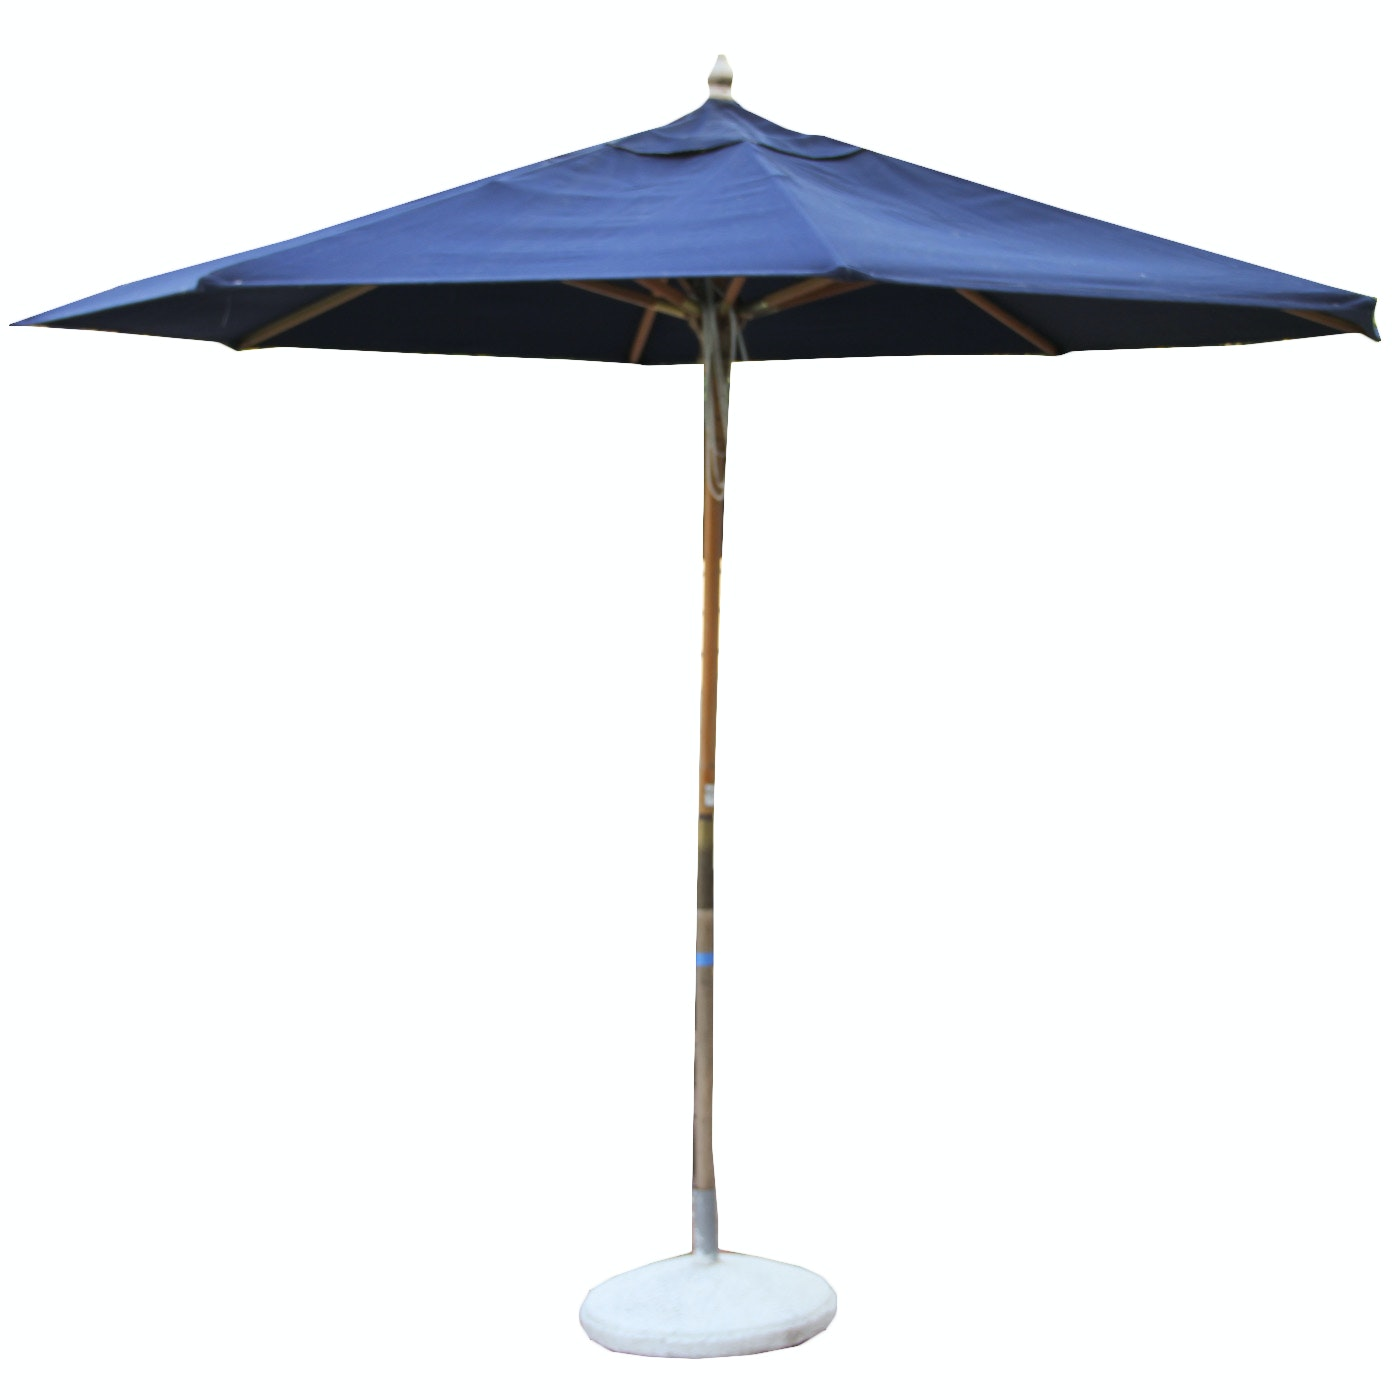 Cobalt Blue Outdoor Umbrella with Concrete Base